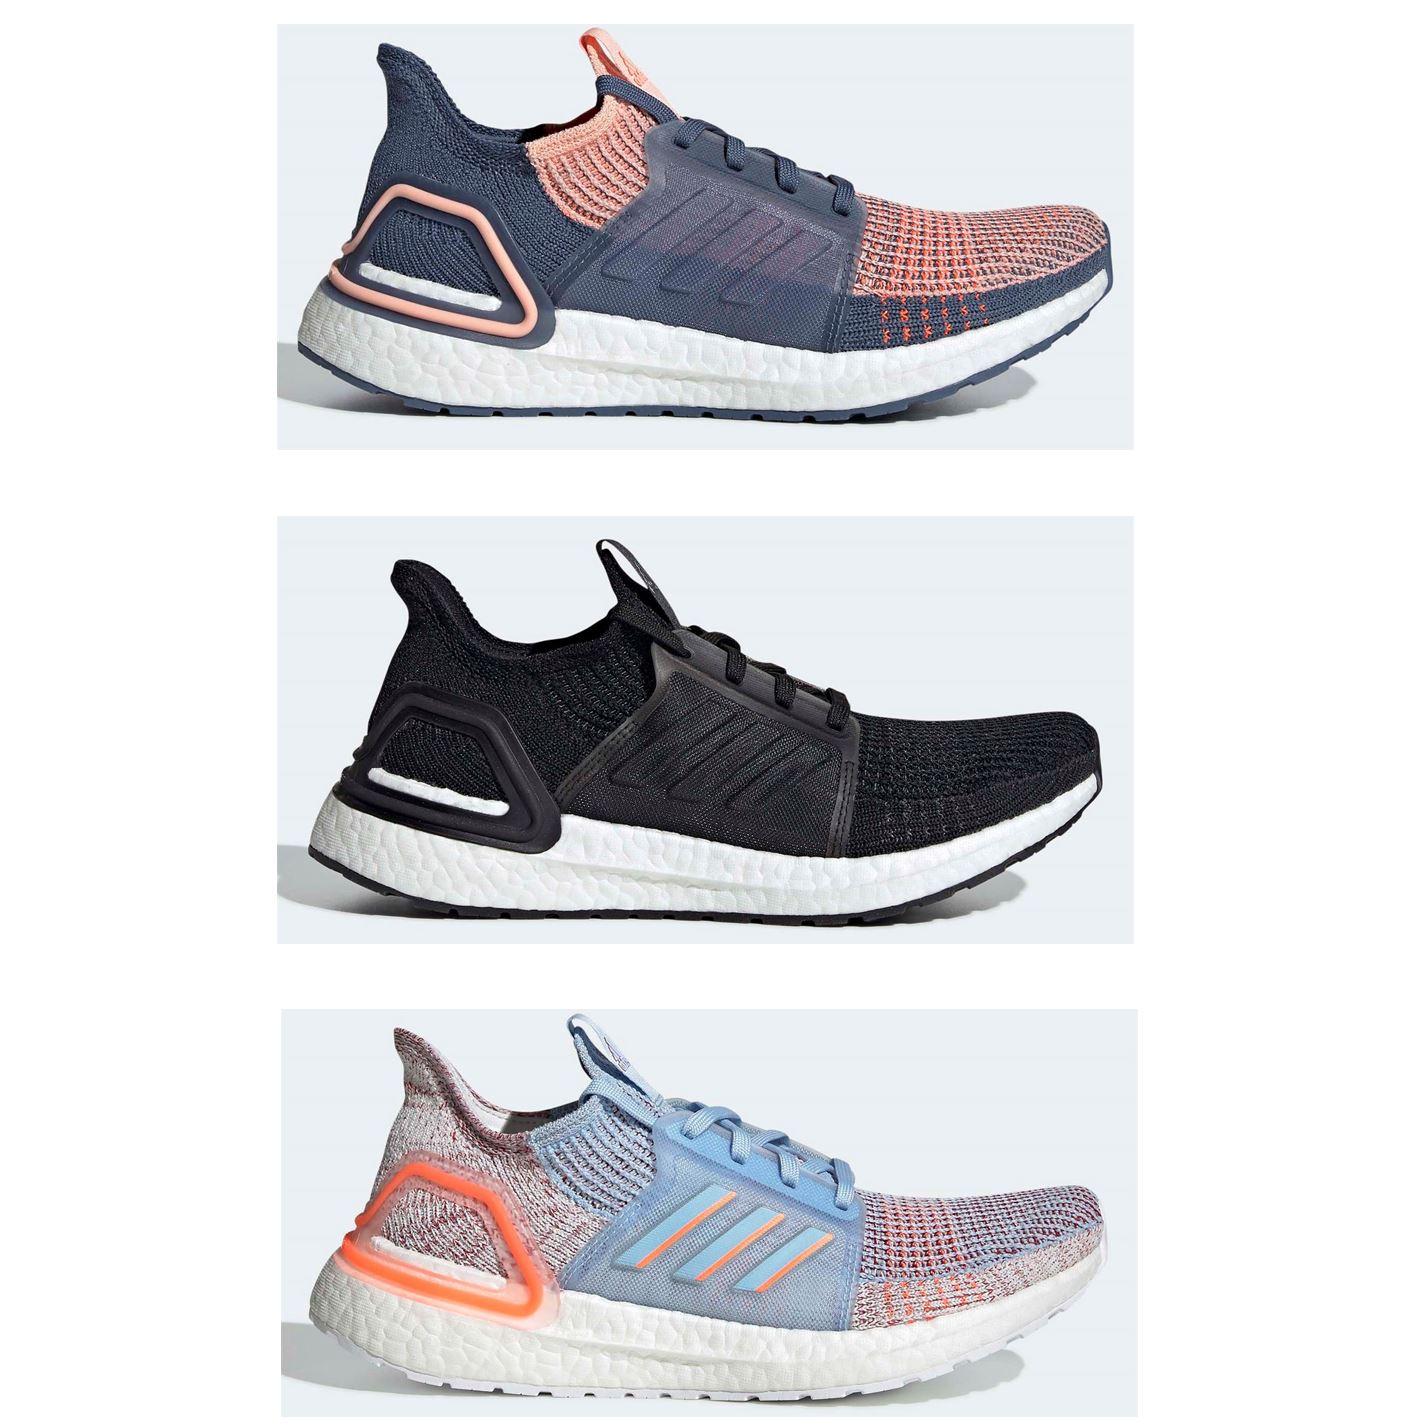 Detalles de Adidas Ultraboost 19 Mujer Zapatillas Running Athleisure Zapatillas